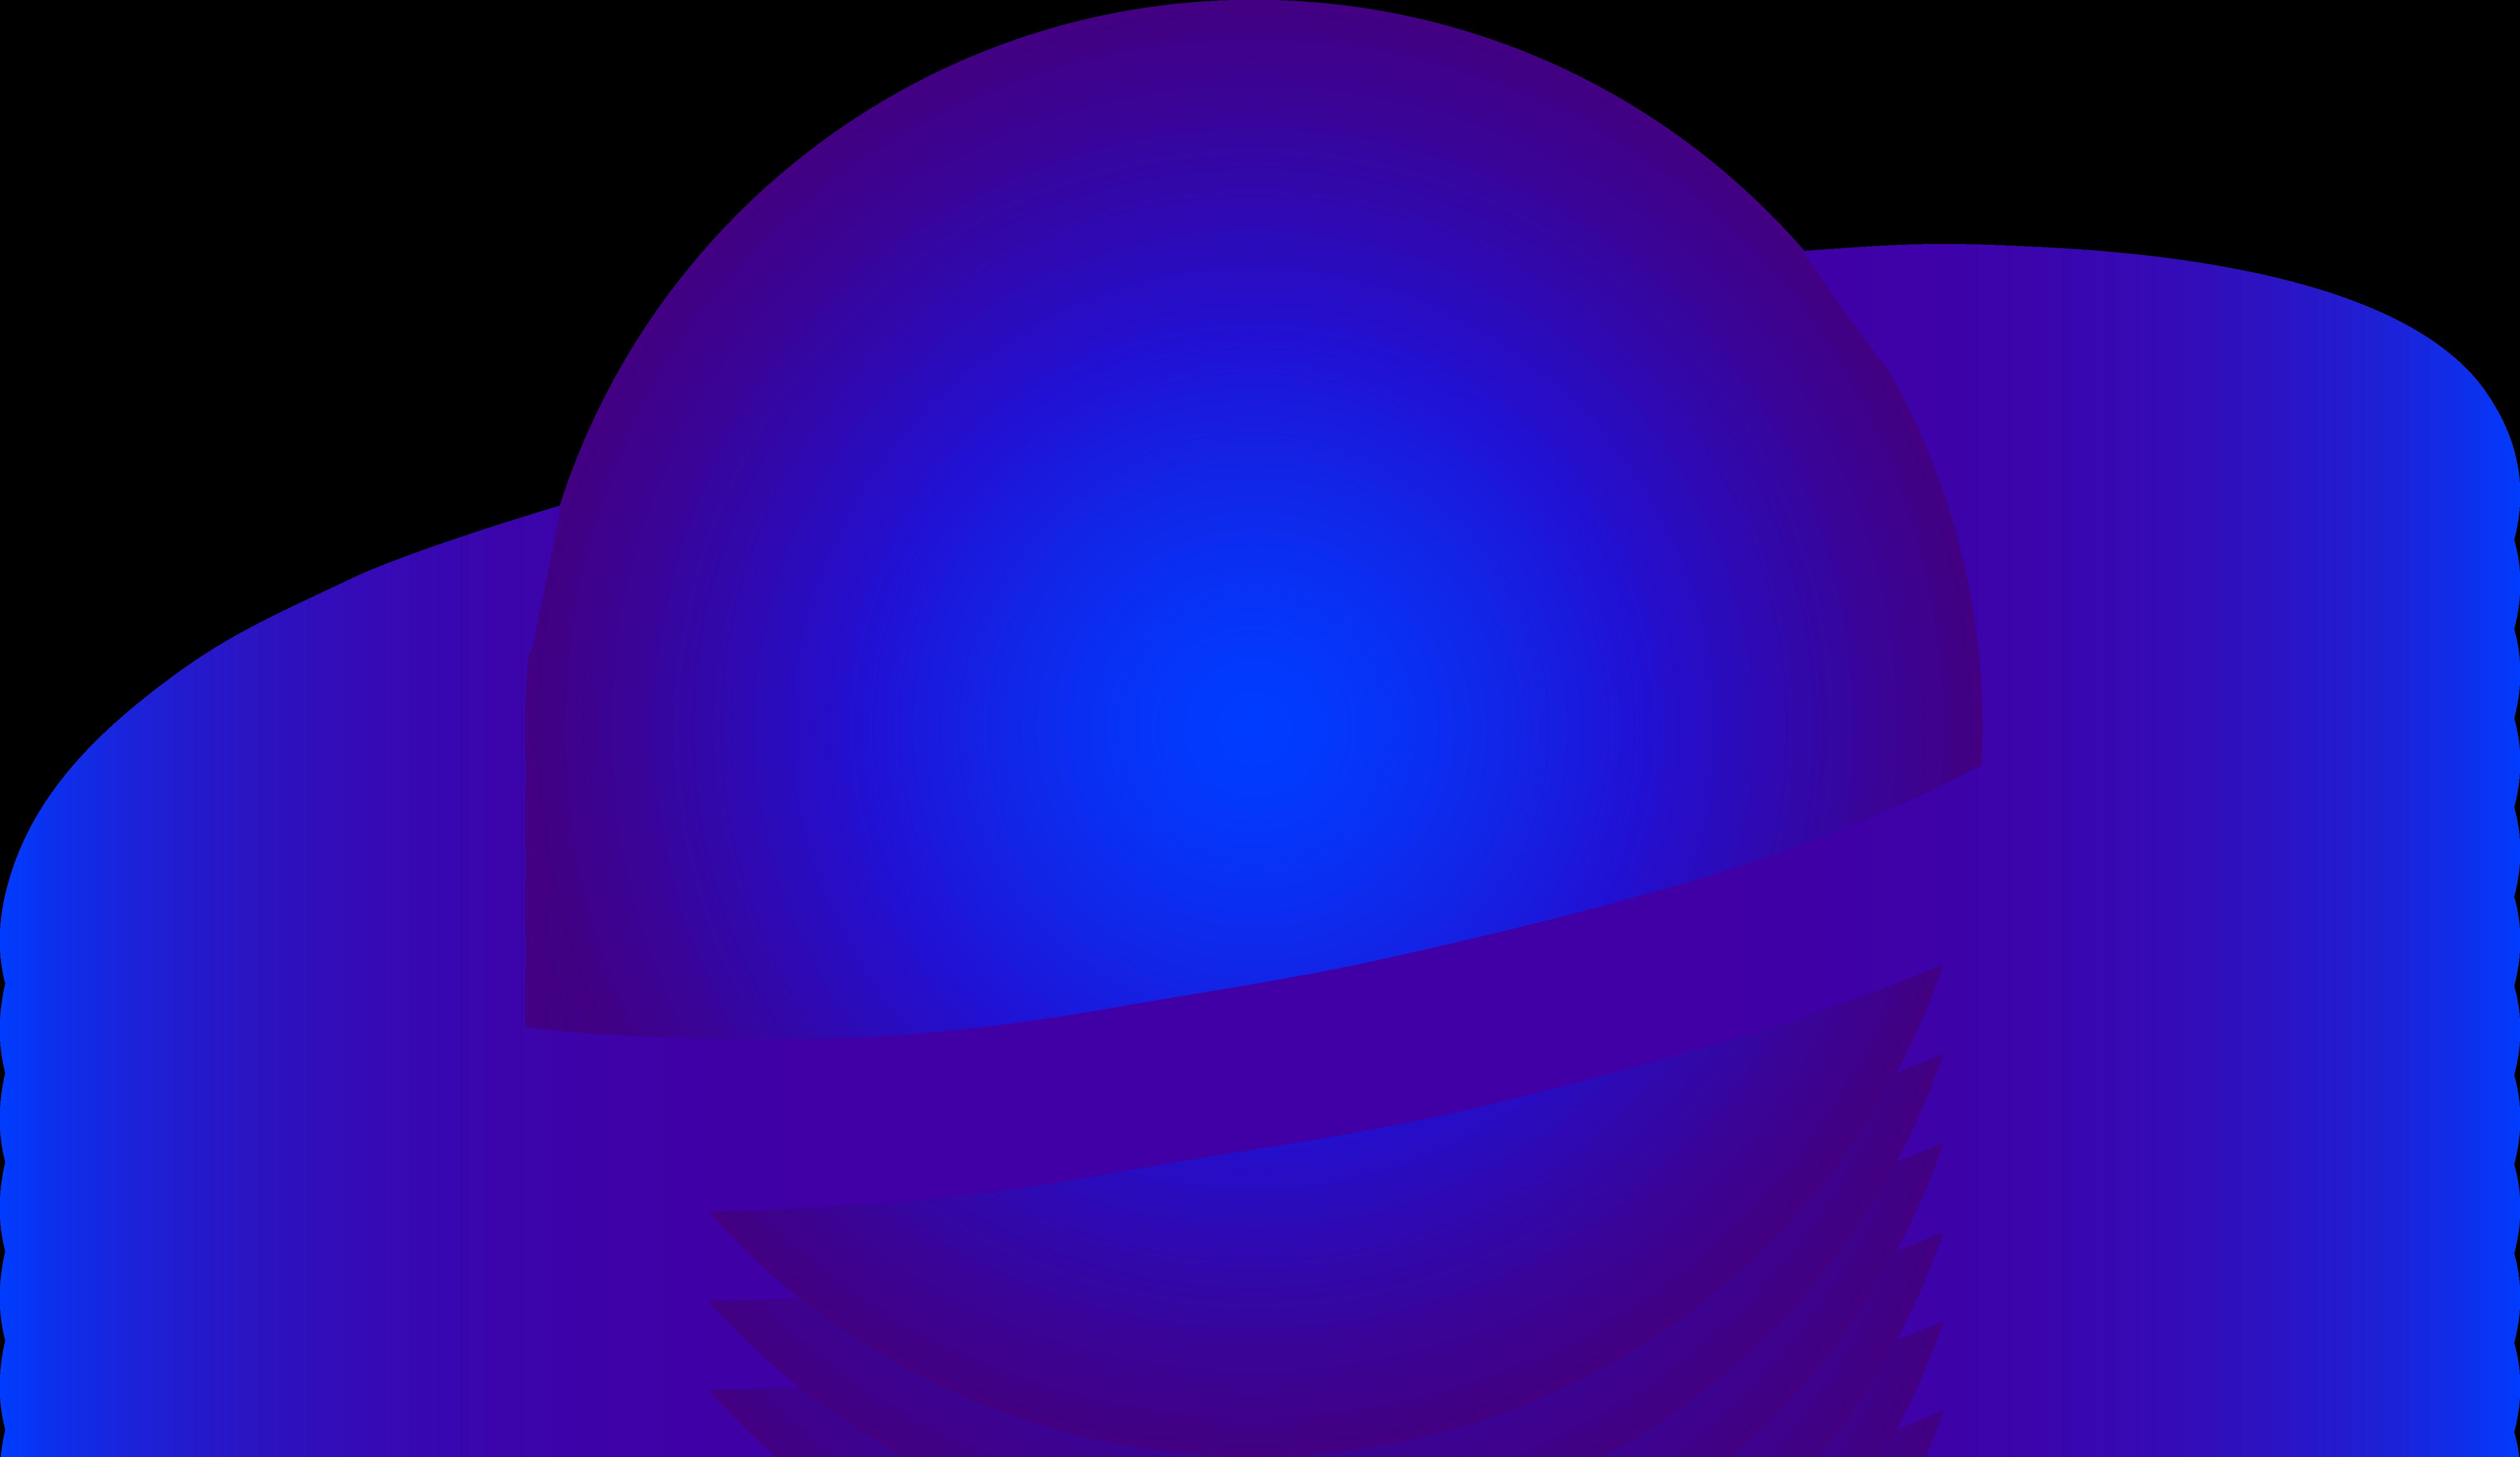 6071x3511 Blue Alien Ringed Planet